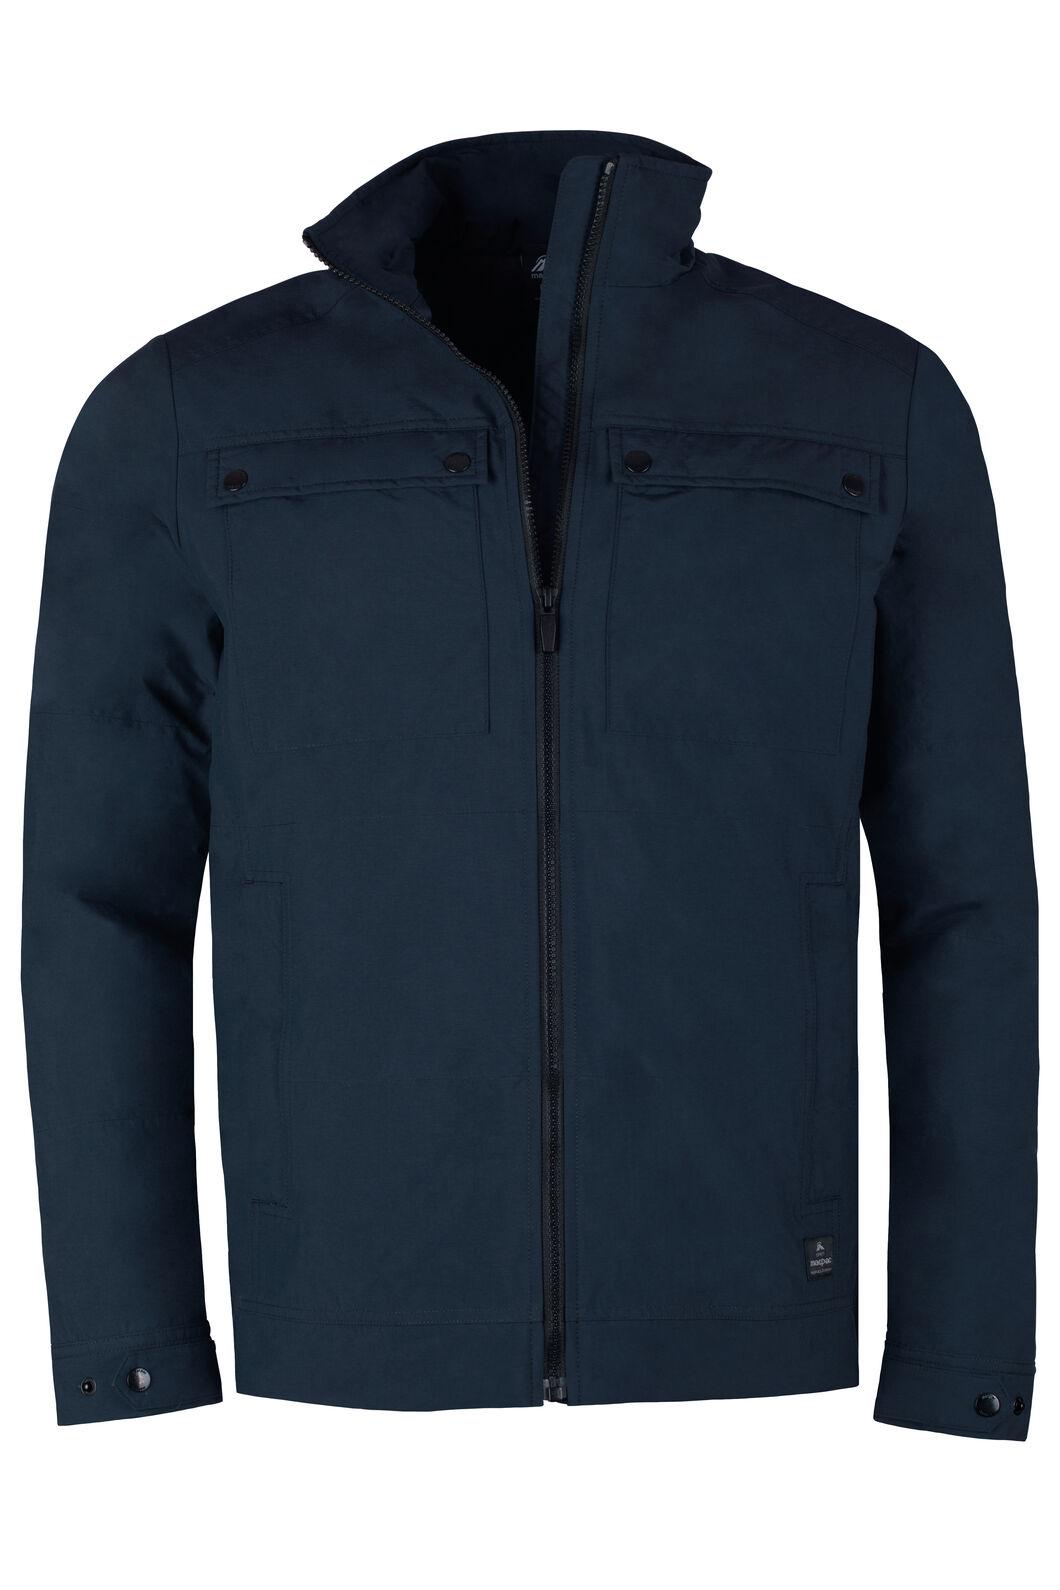 Freefall PrimaLoft™ SILVER Jacket - Men's, Black Iris, hi-res